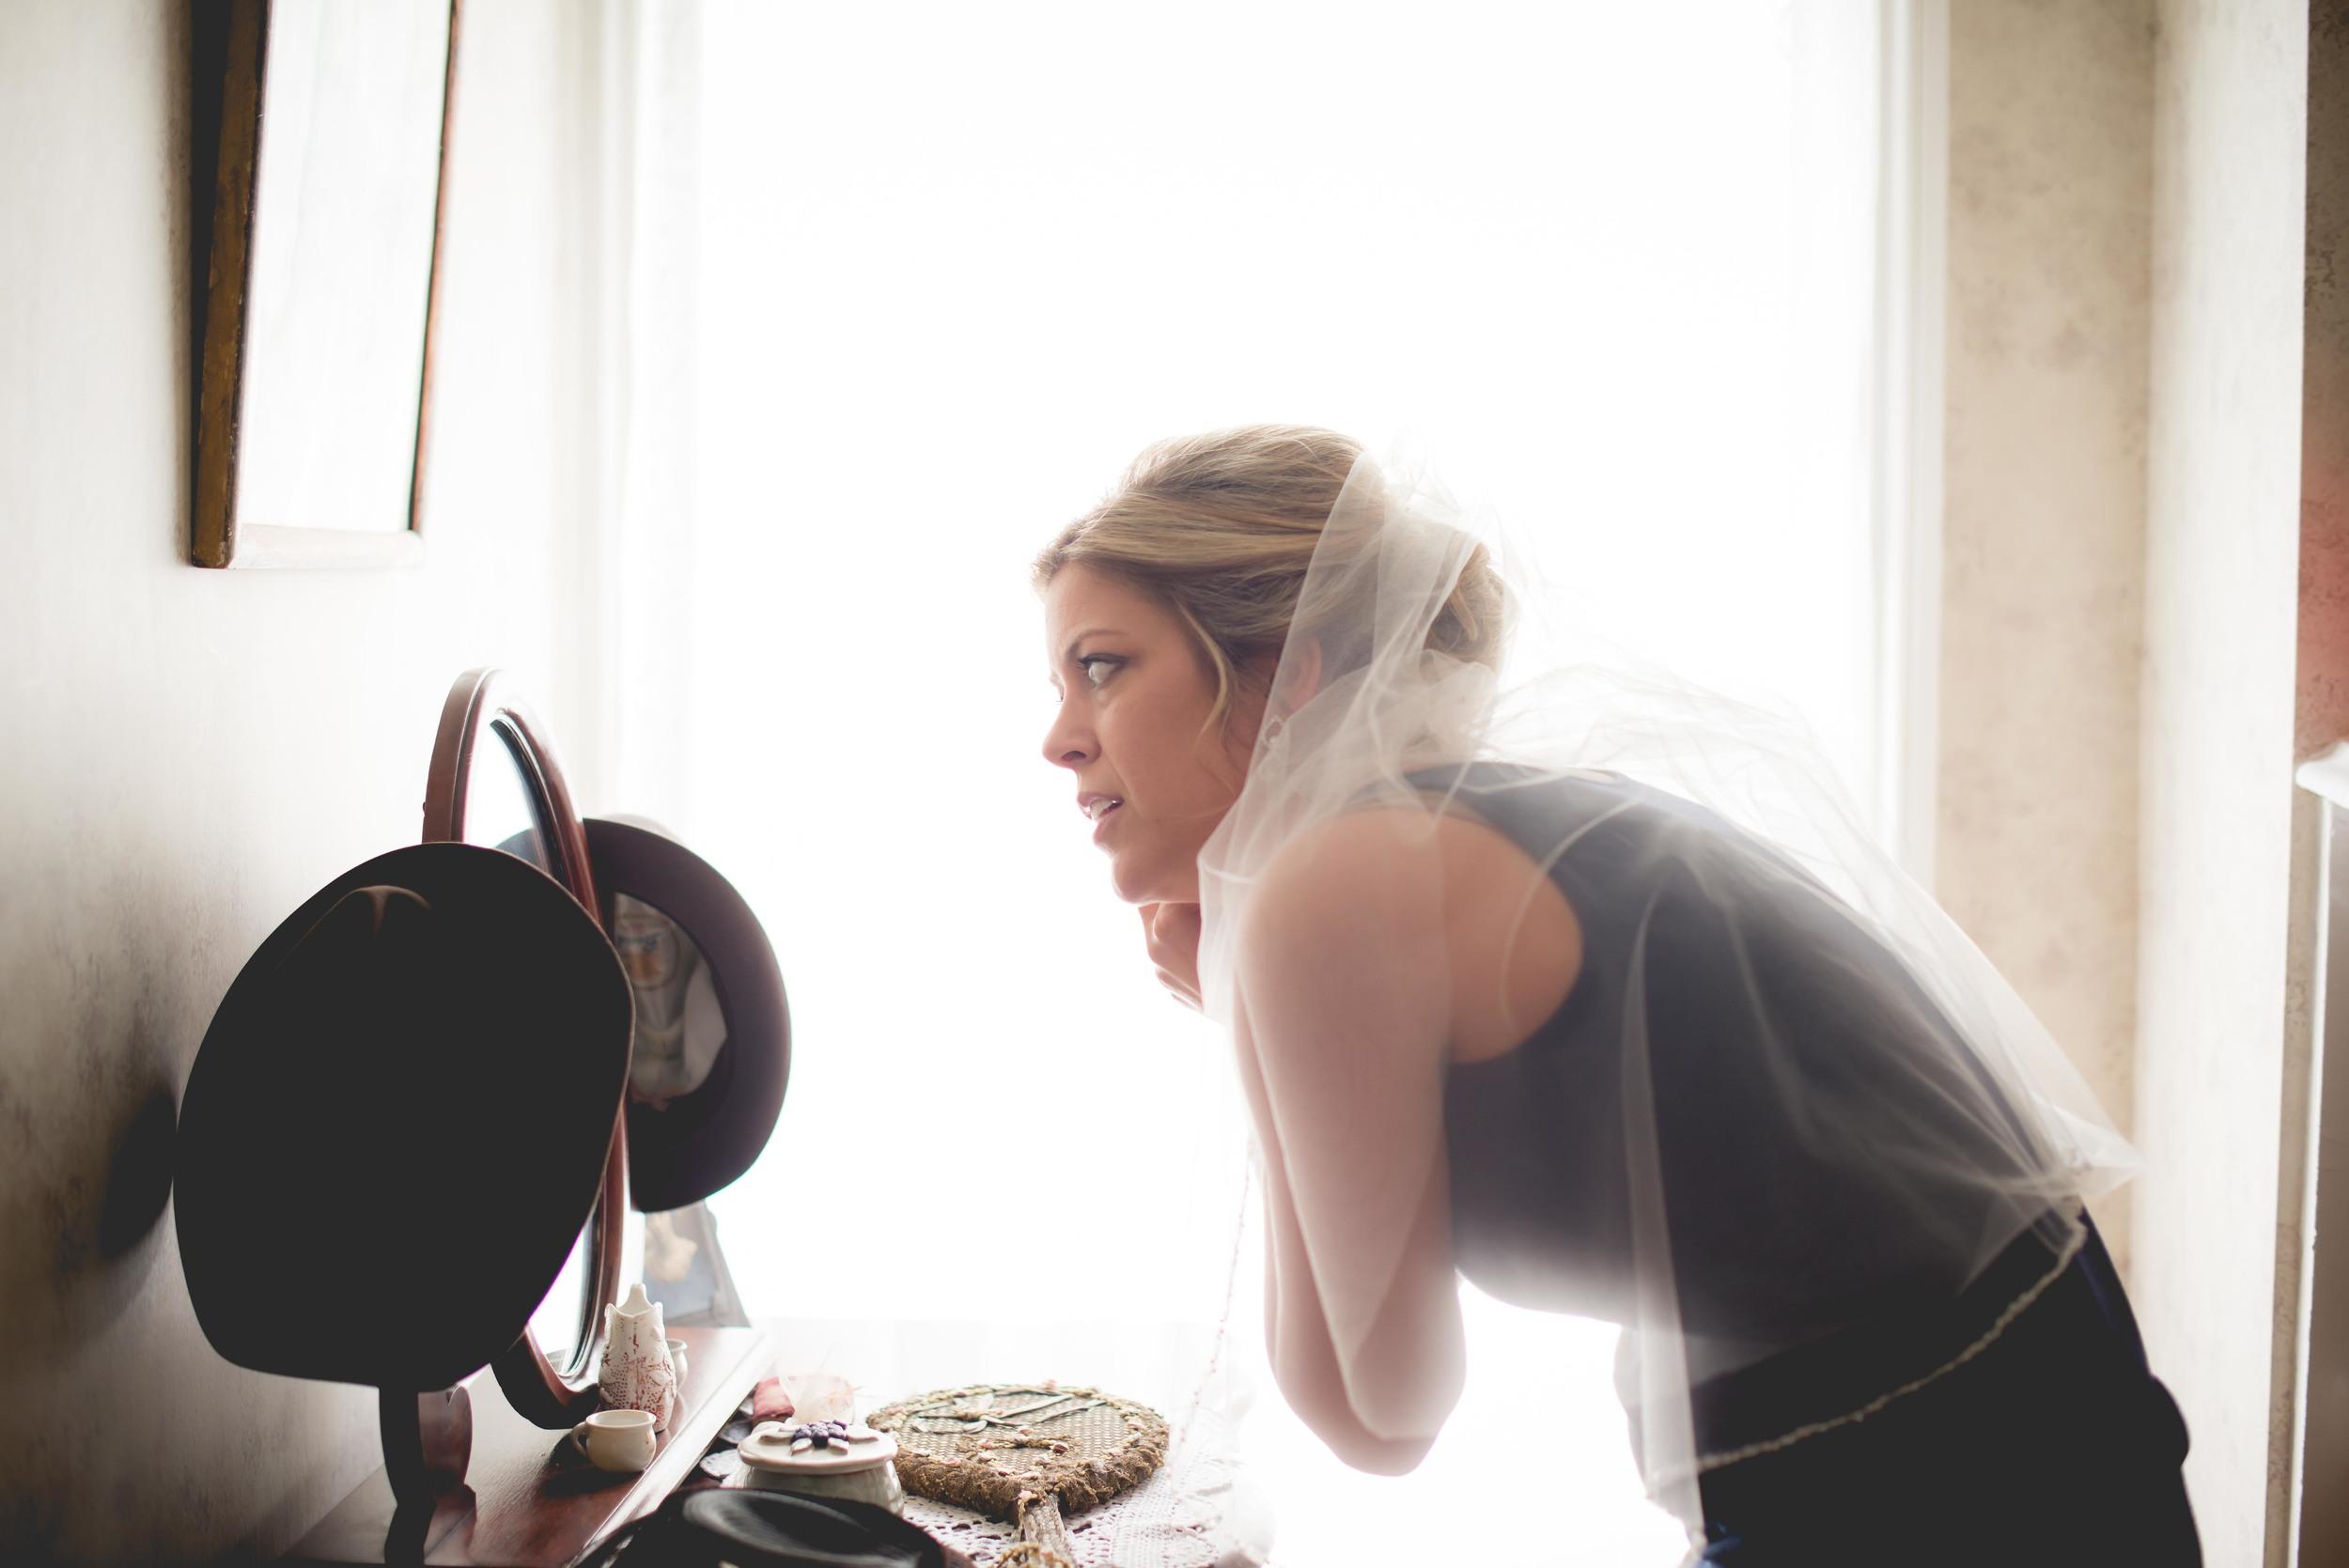 sarasutterphotography_leeandshalon_wedding_2015-83.jpg